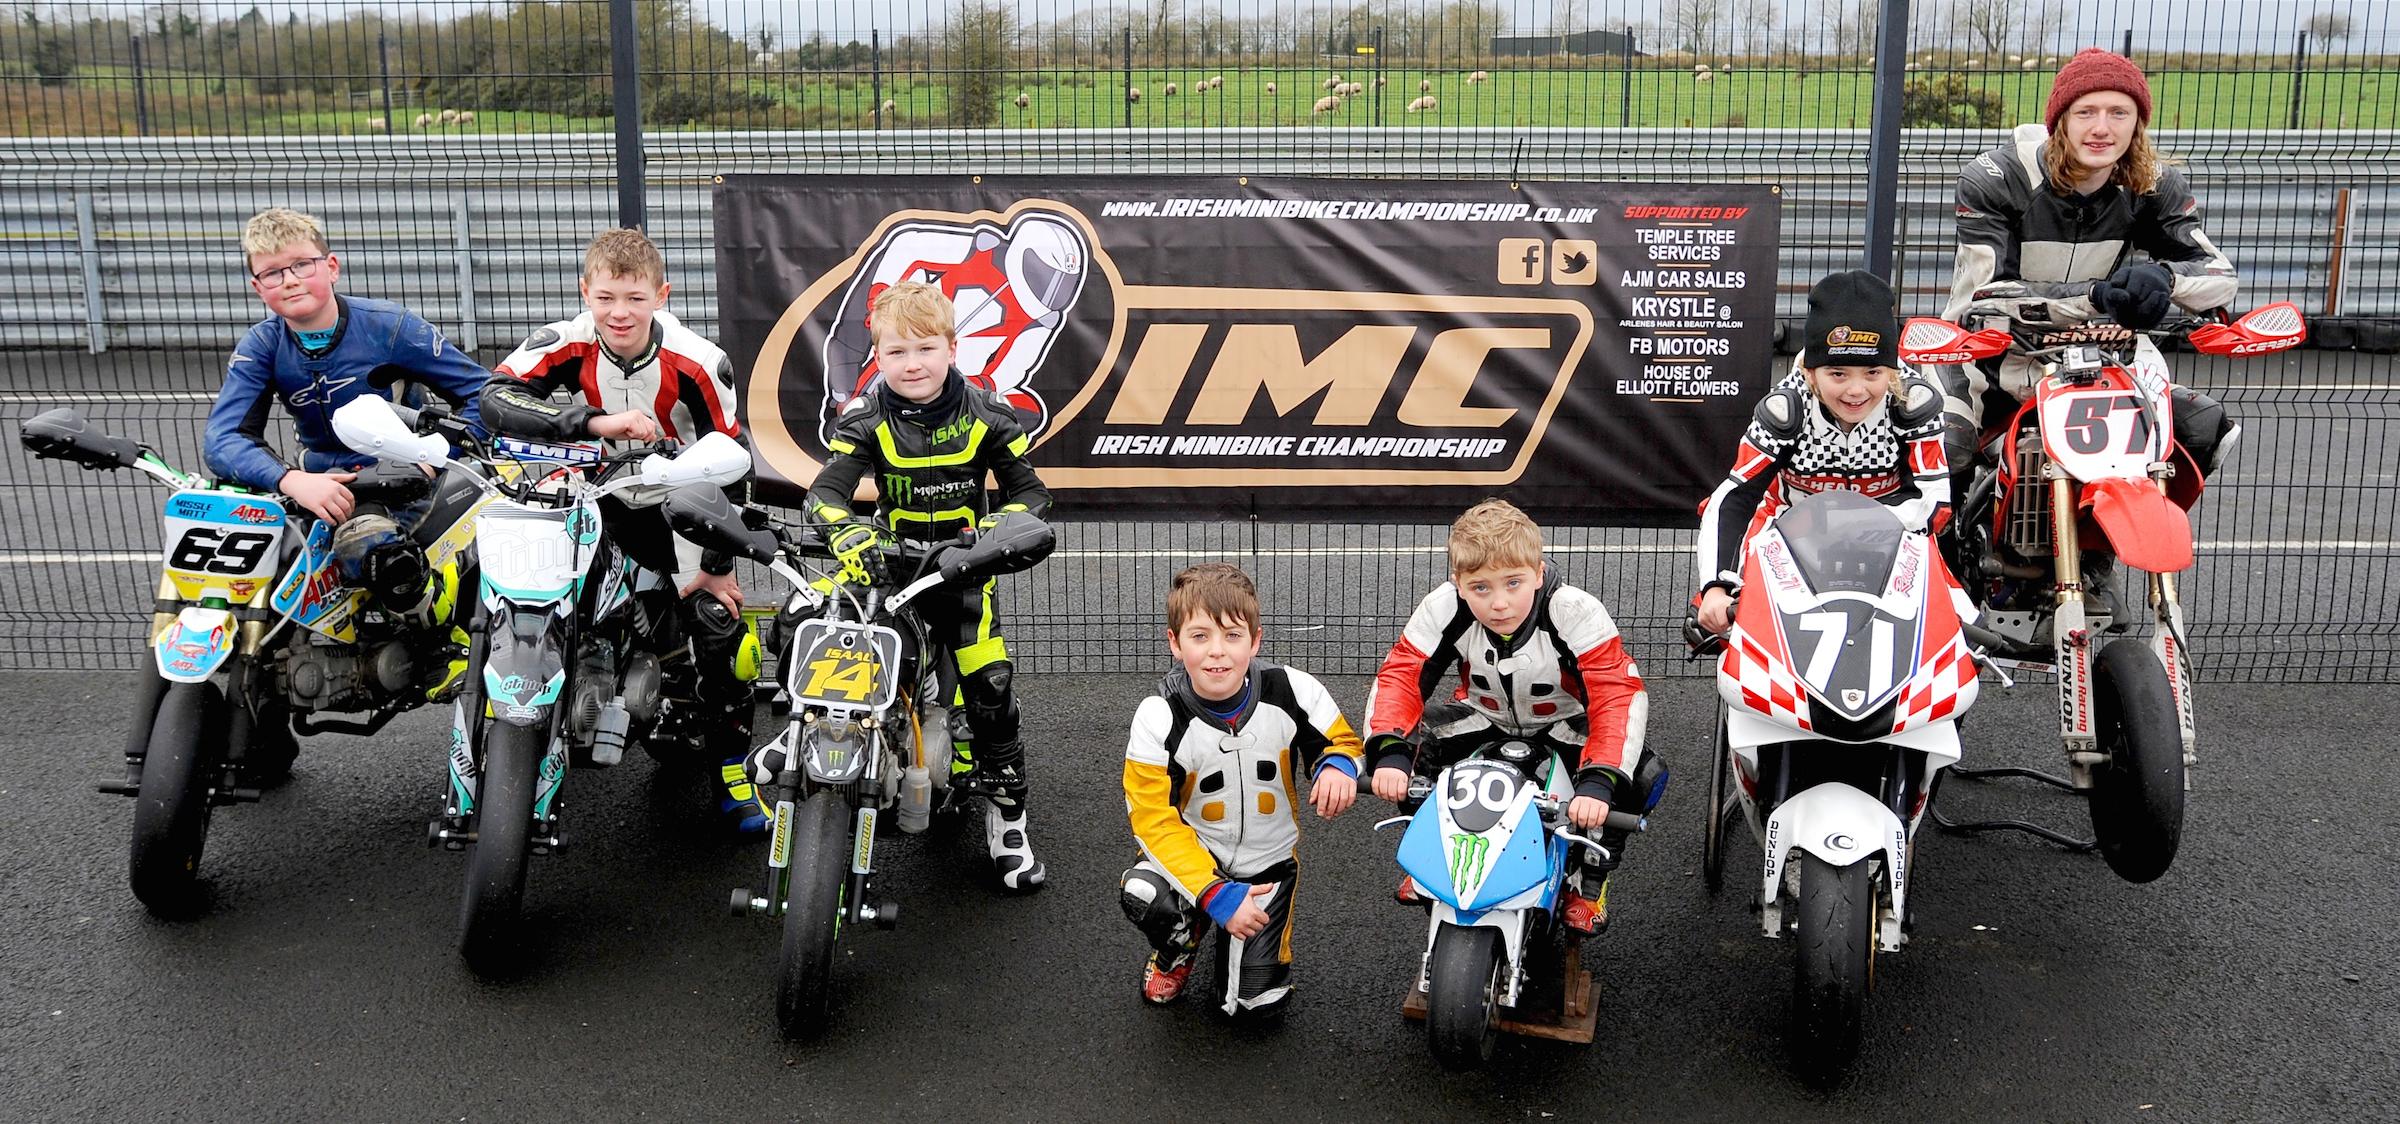 IMC Riders